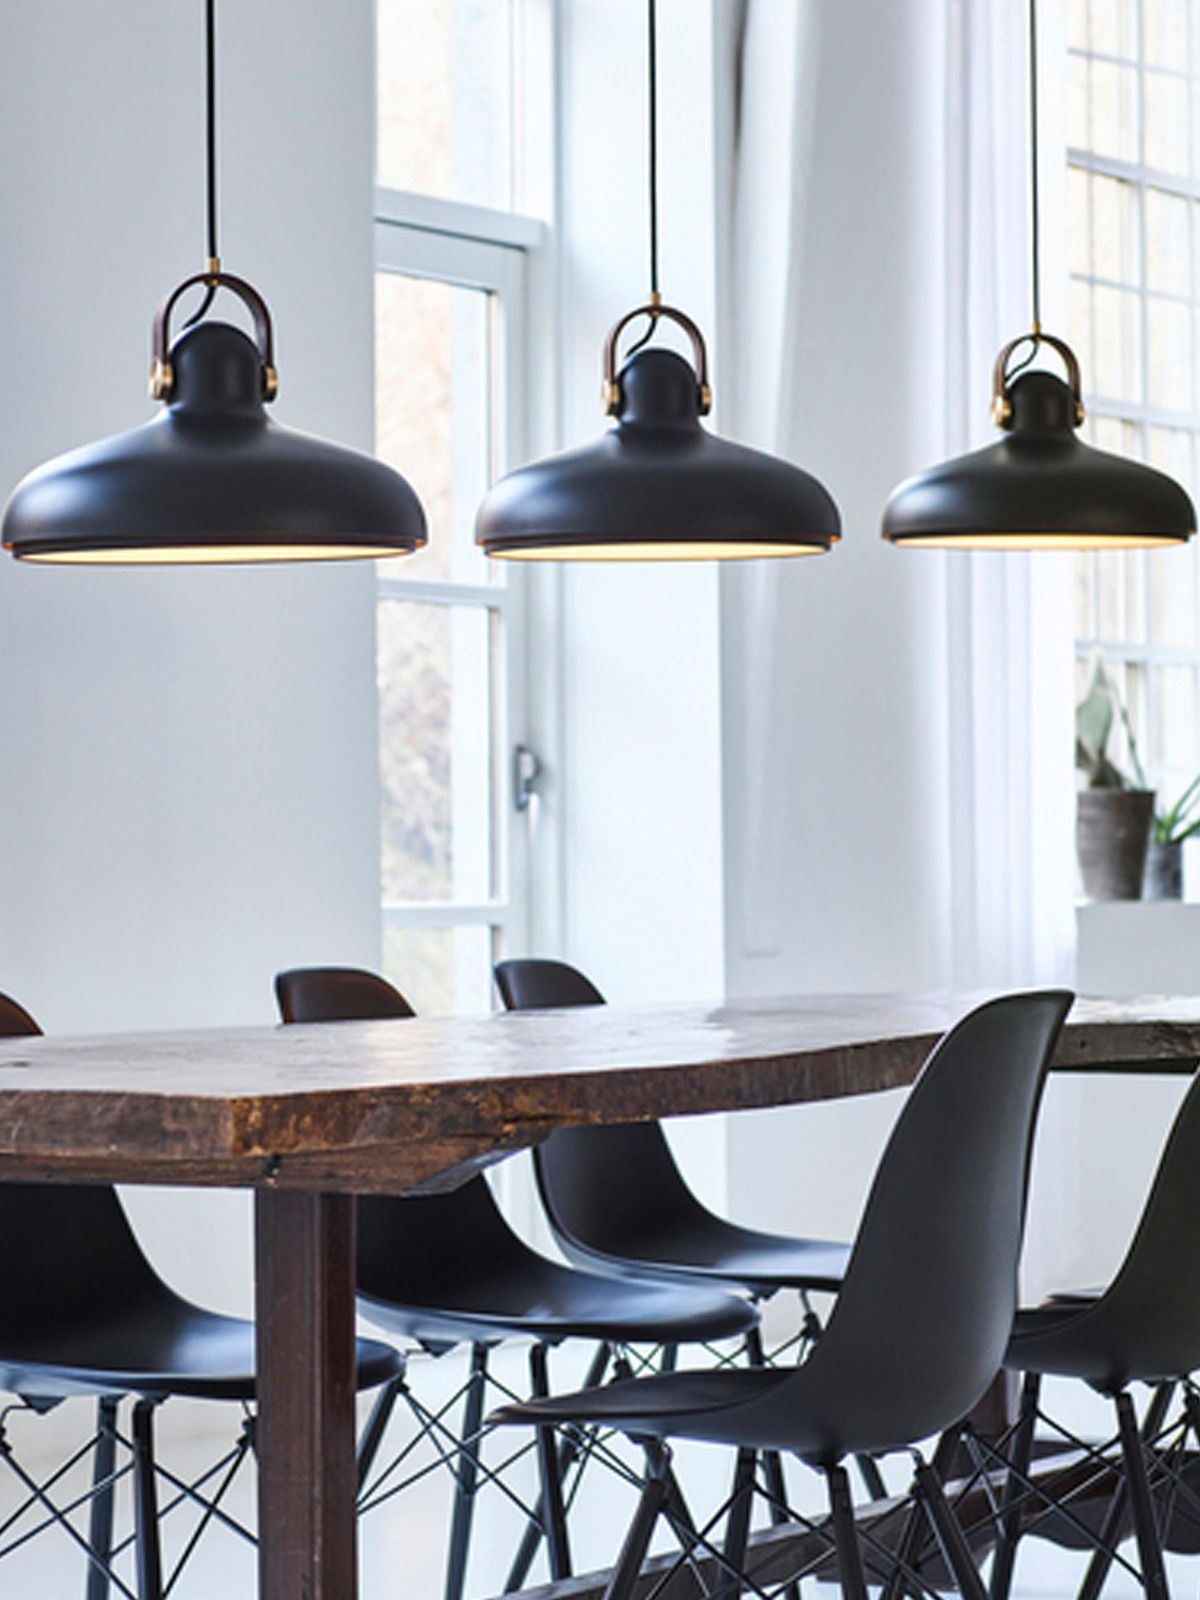 Carronade Large Pendeleluchten Le Klint Dänemark Design DesignOrt Berlin Lampen Leuchten